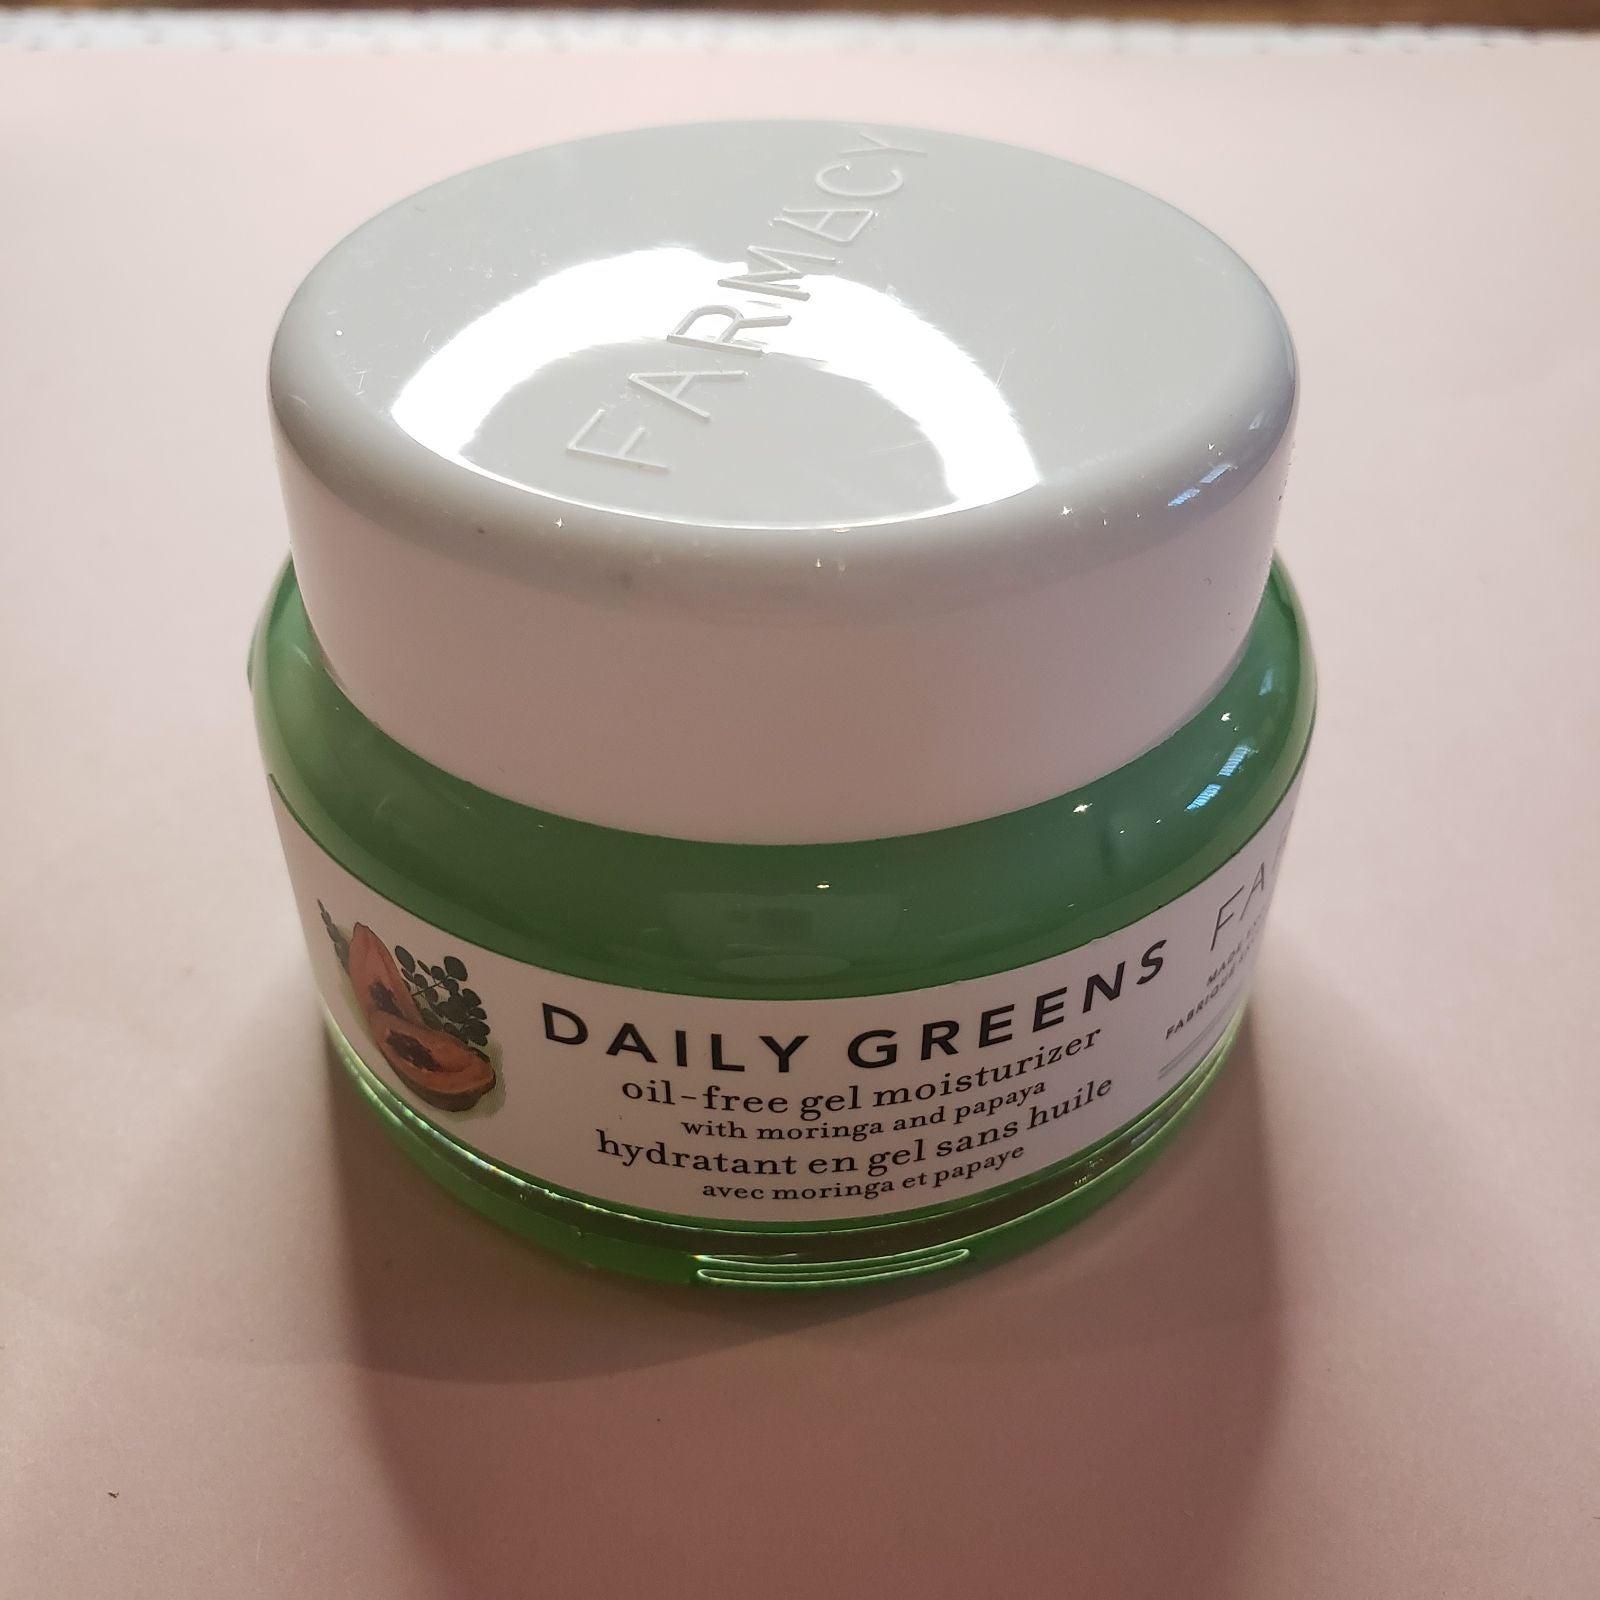 Farmacy Daily Greens Oil Free Gel Moistu